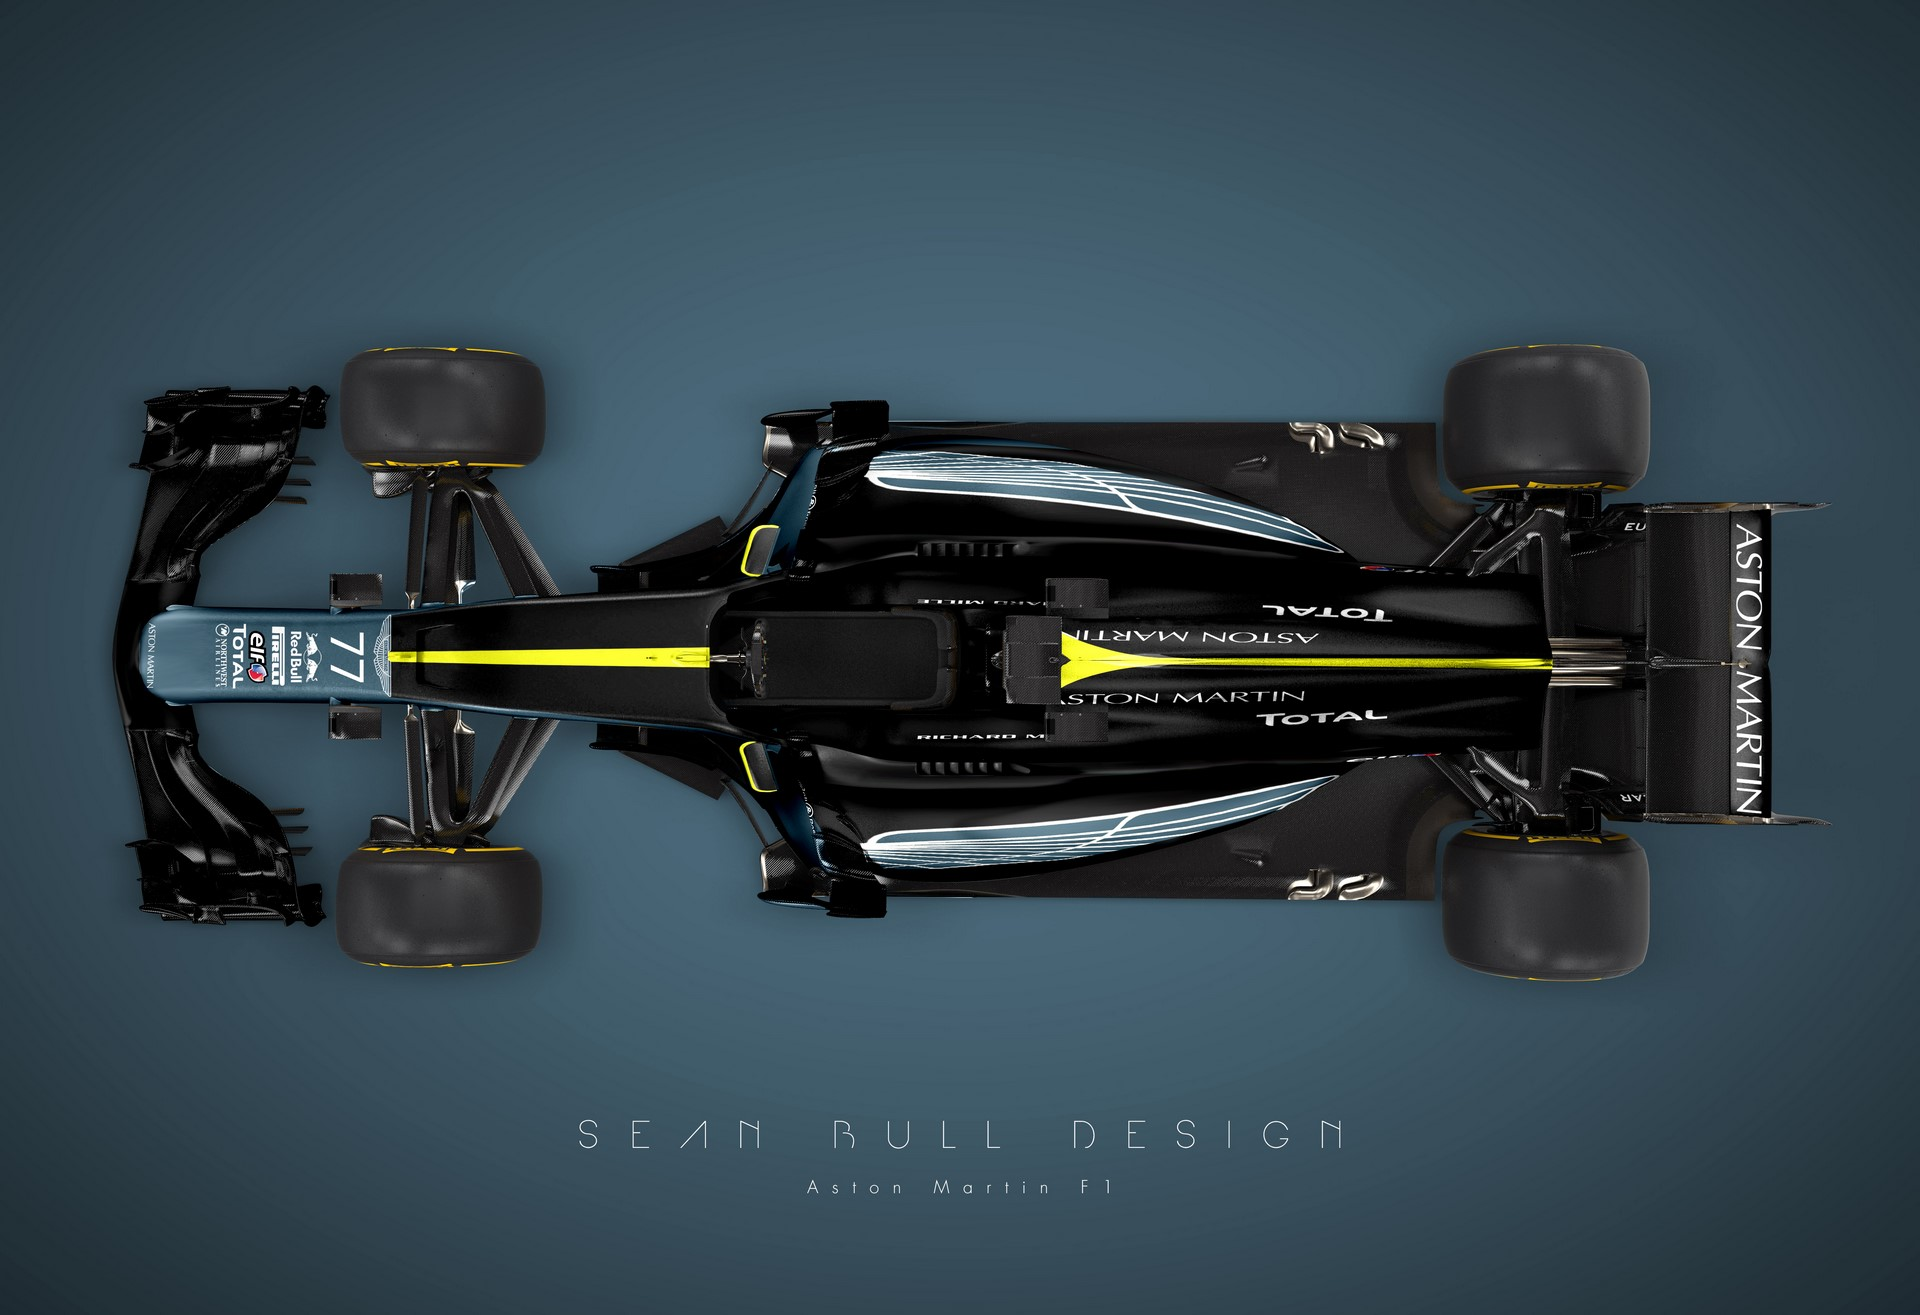 Aston Martin F1 (9)